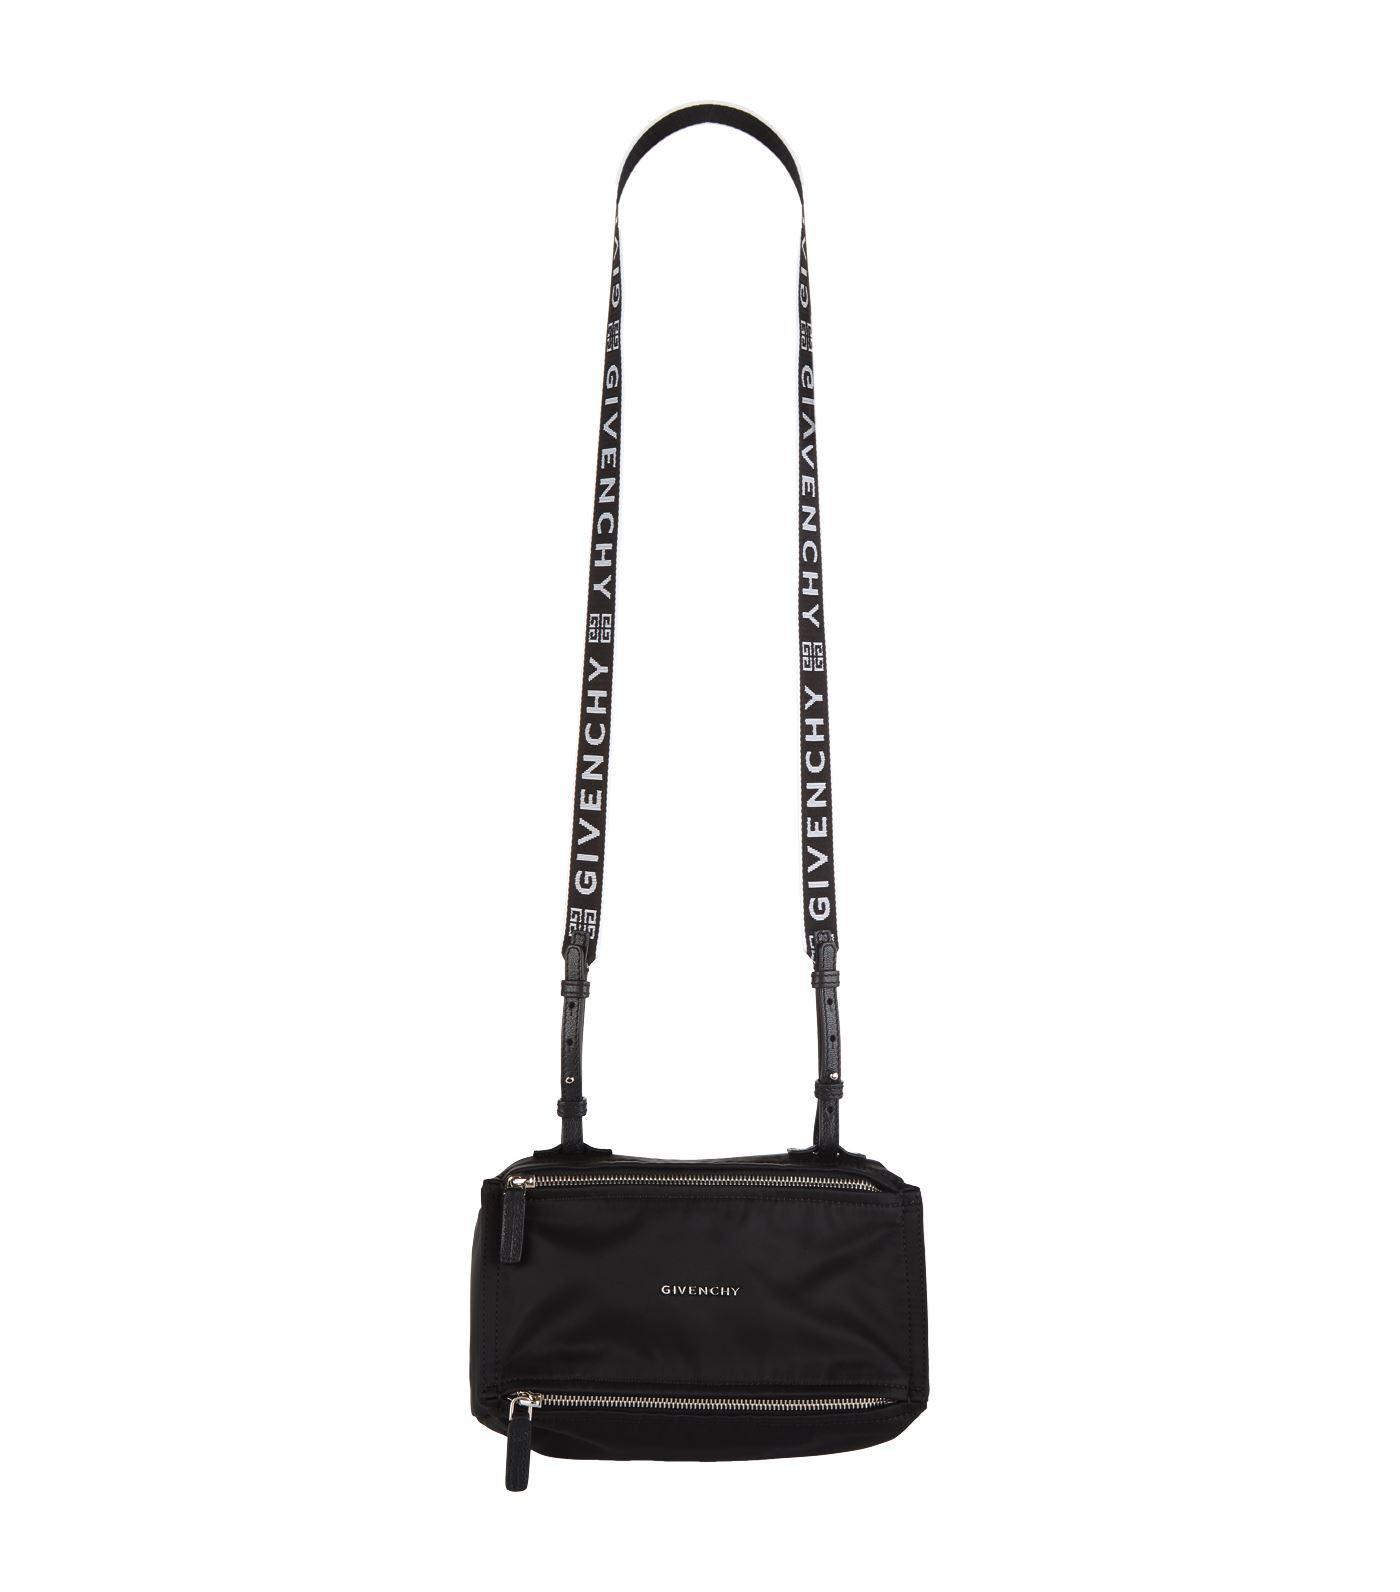 2ba63b4b4a Givenchy Mini Nylon Pandora Messenger Bag in Black - Lyst